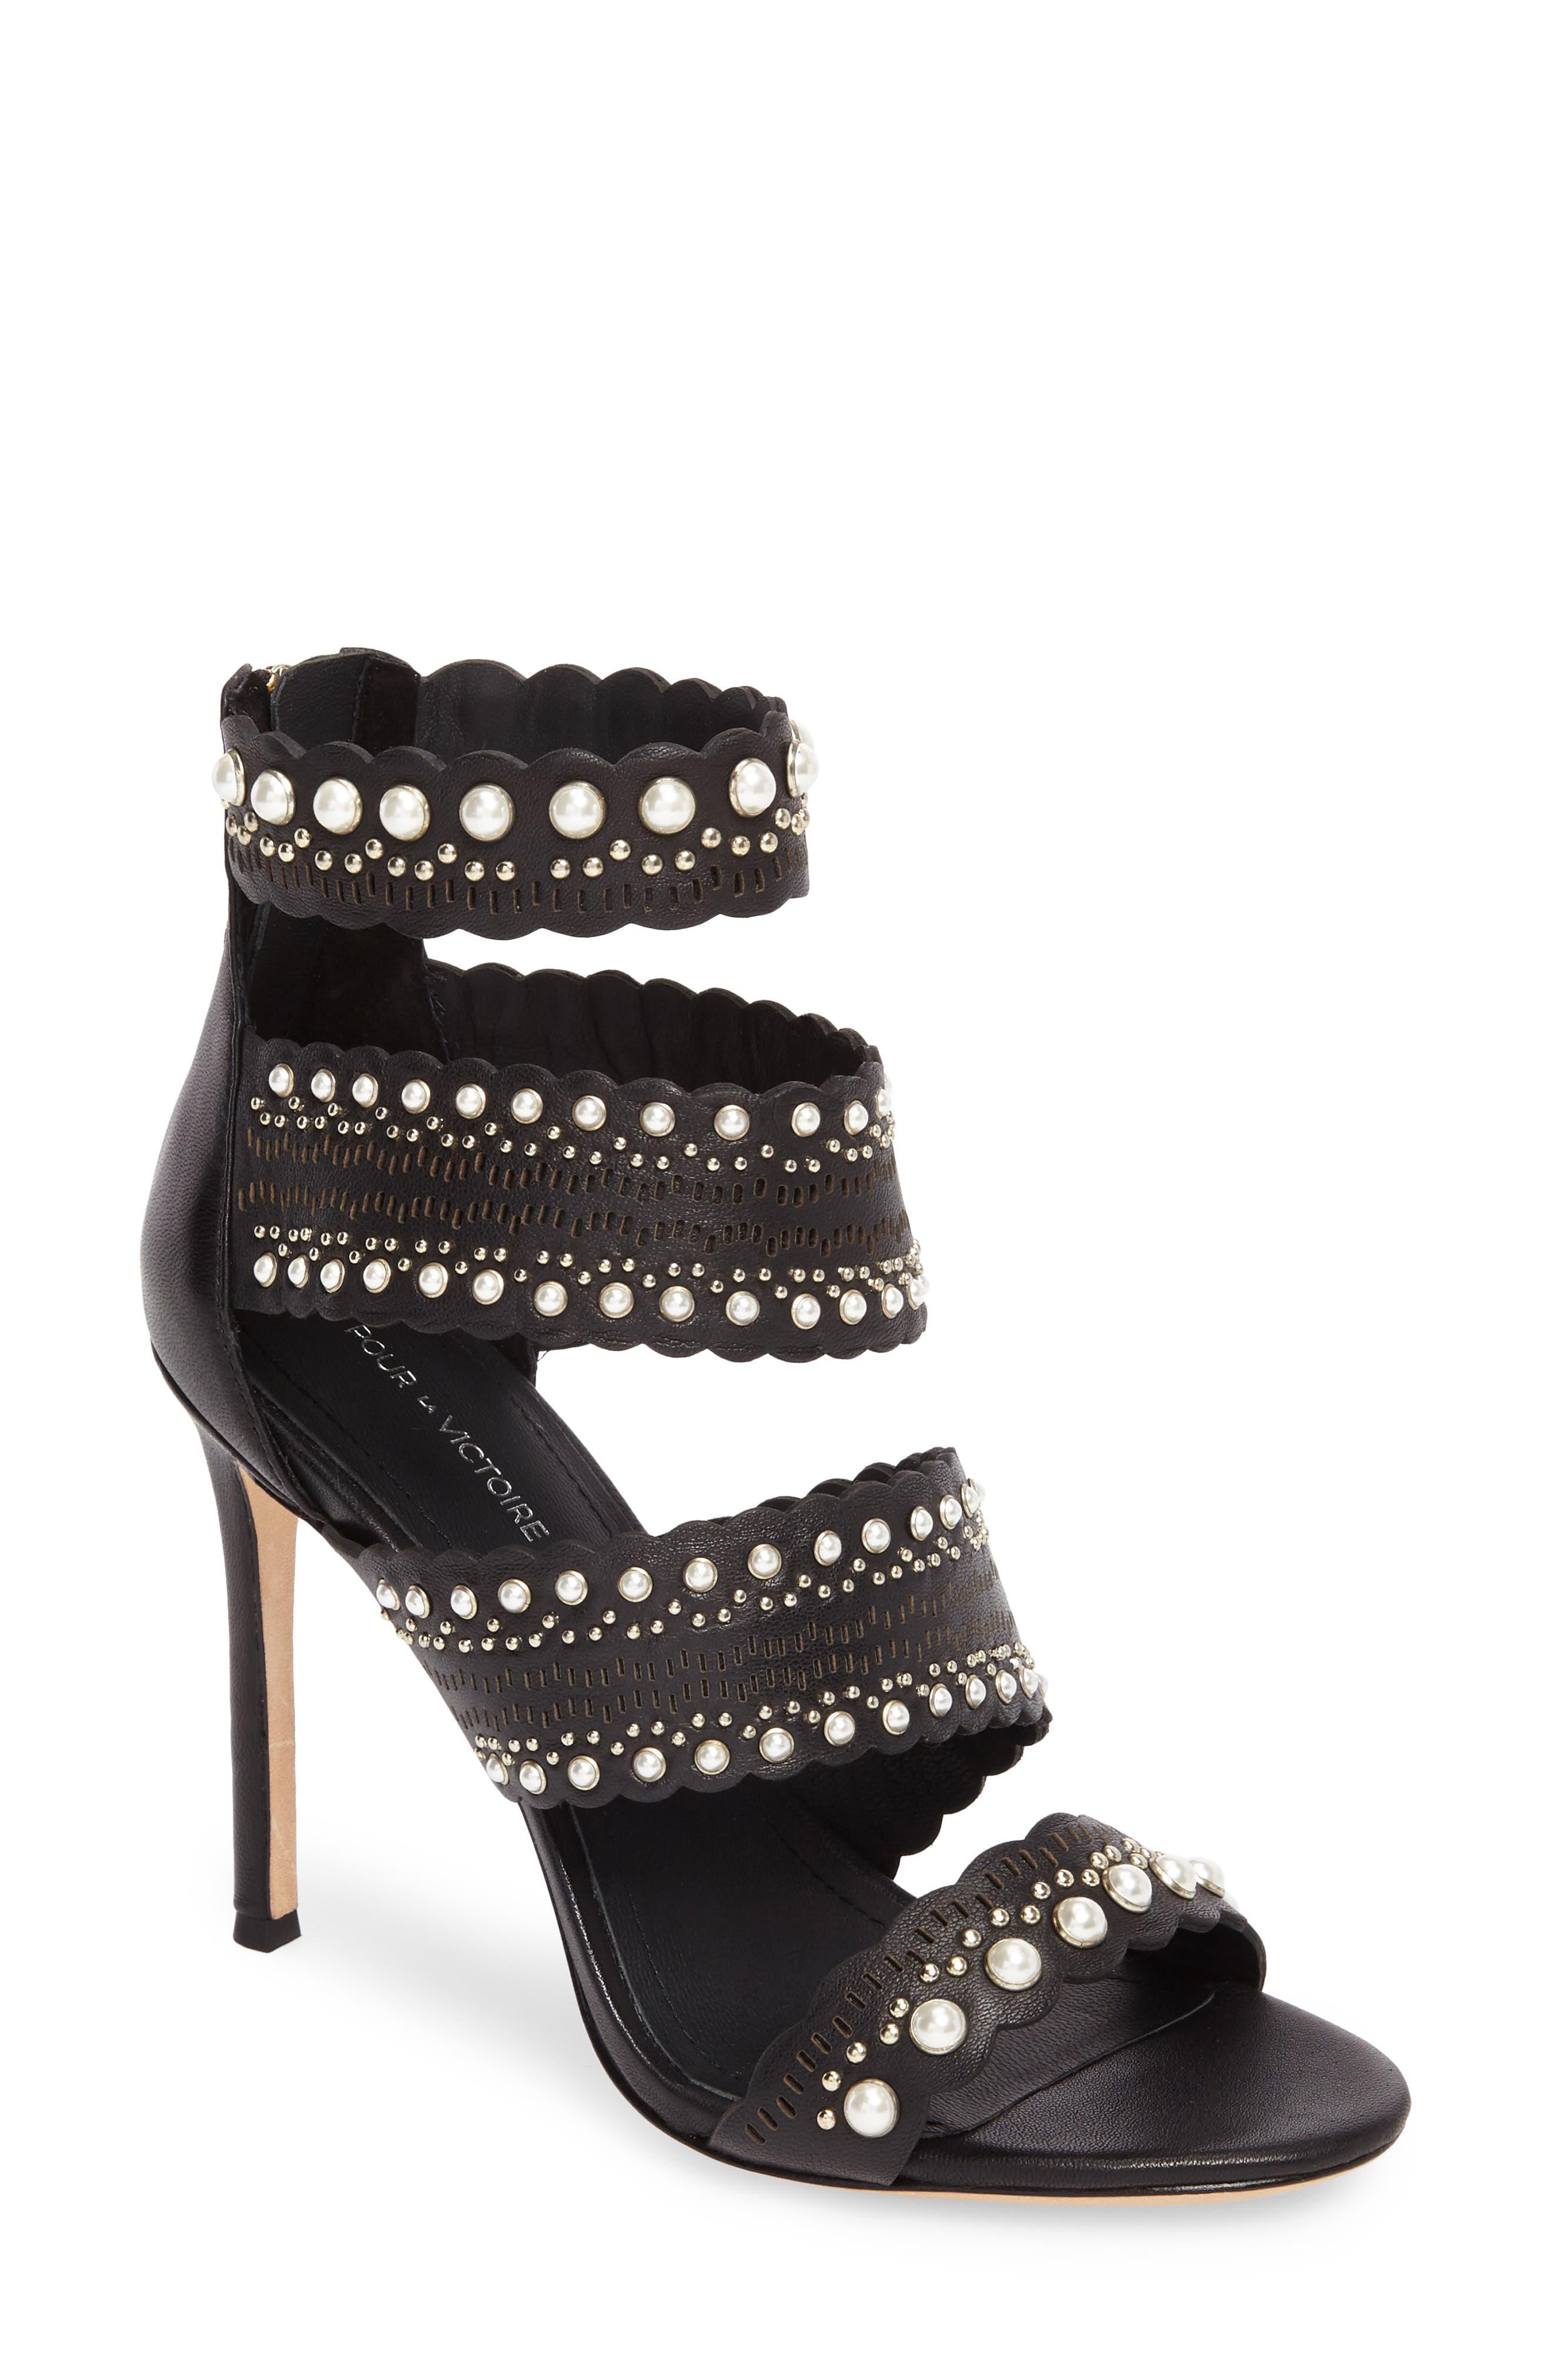 Ellura Scalloped Strap Sandal,                         Main,                         color, Black Leather